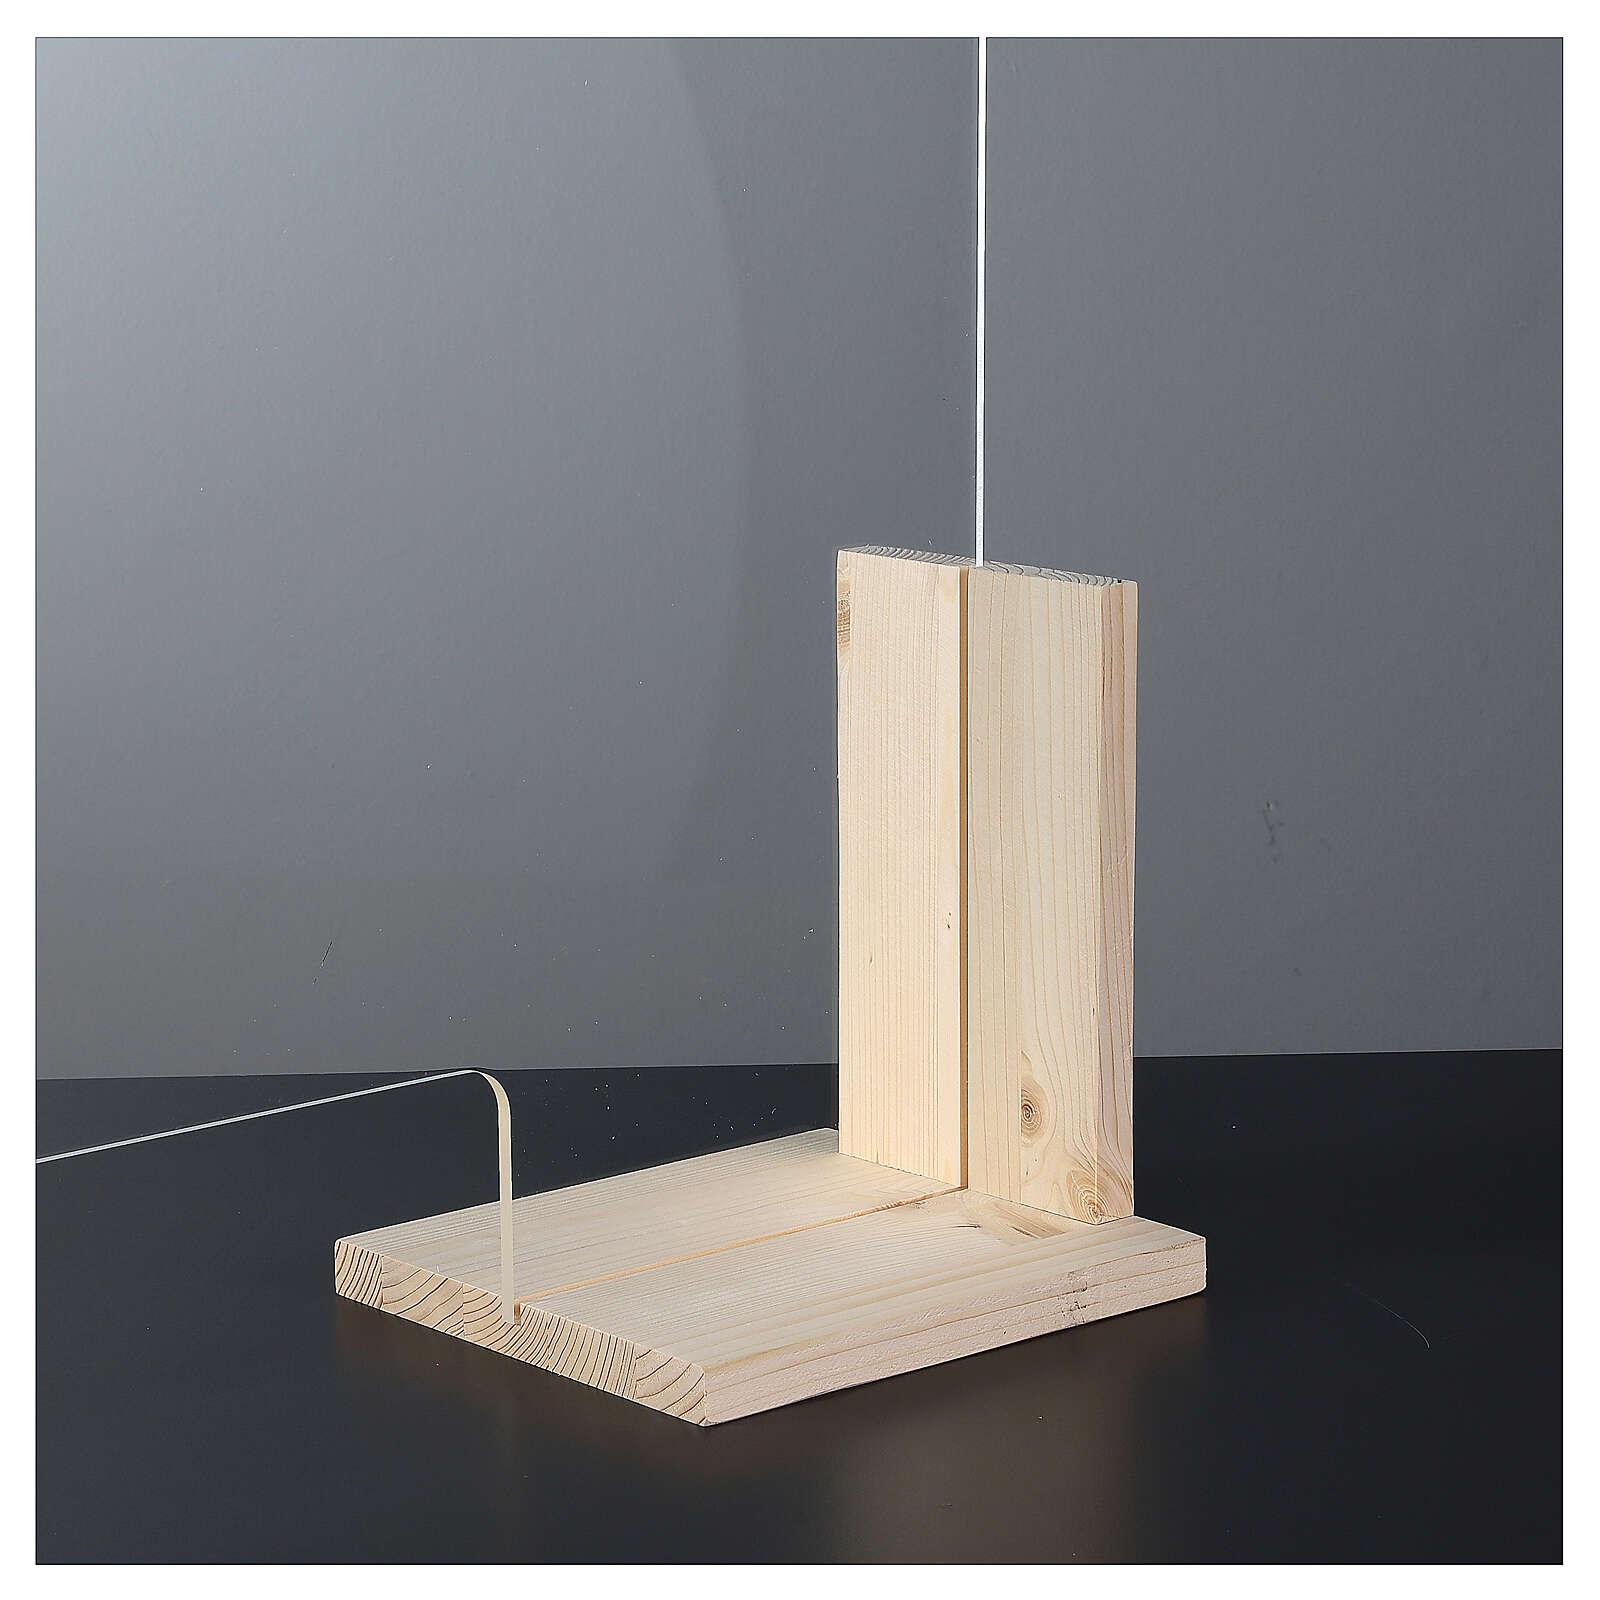 Plexiglass screen Wood Design h 65x95 cm- cutout window h8x32 cm 3